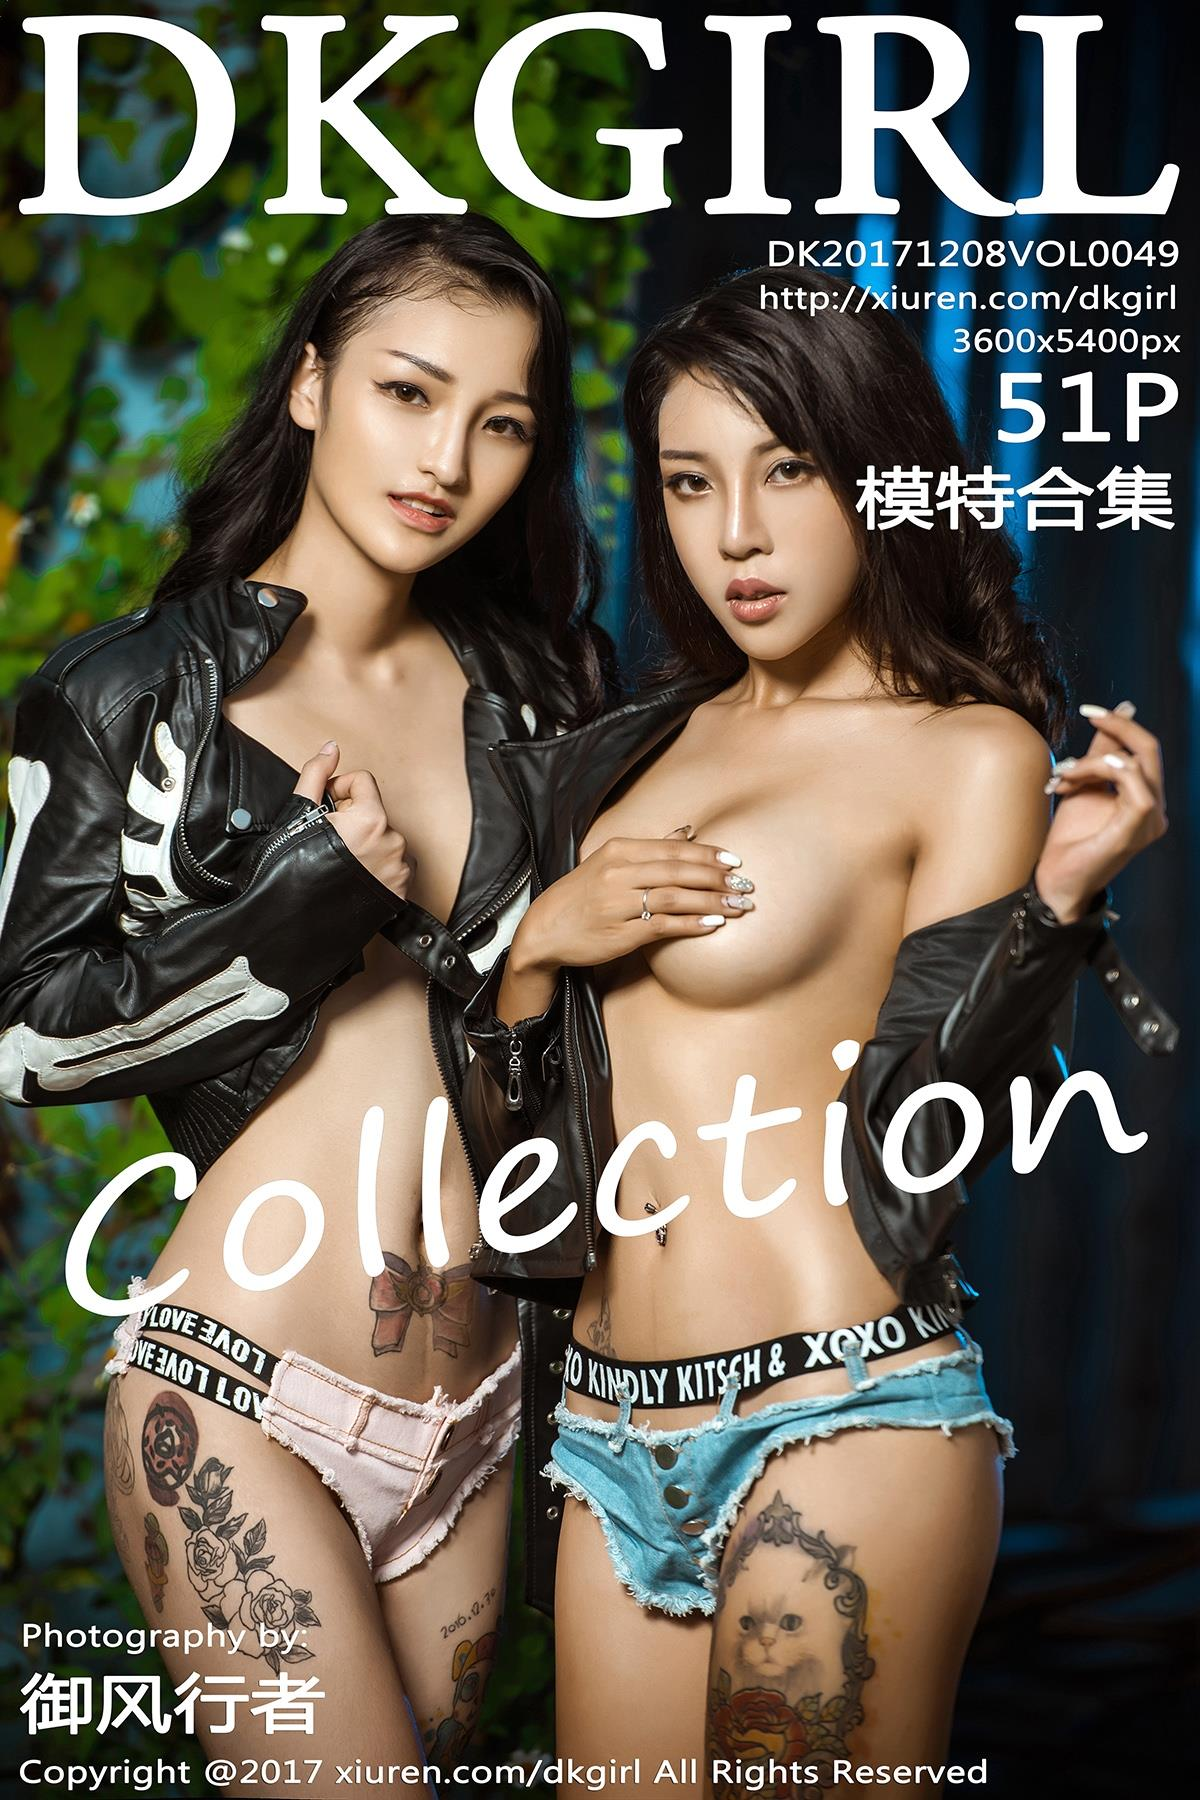 [DKGirl御女郎]DK20171208VOL0049 性感狂野美女模特私房写真合集